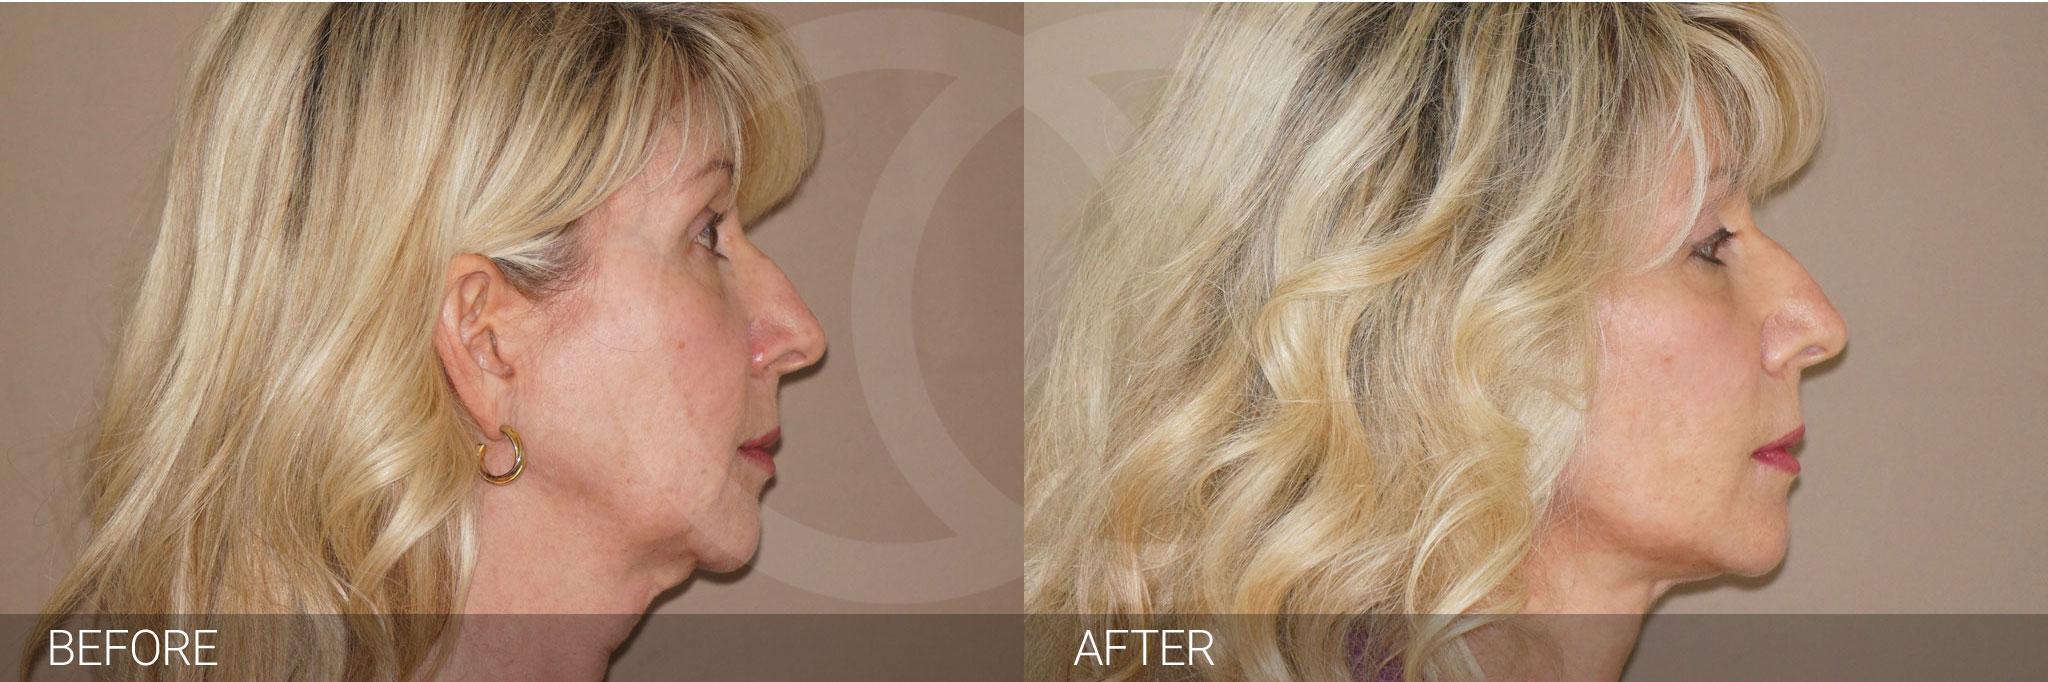 Fat grafting Facial fat transfer ante/post-op III